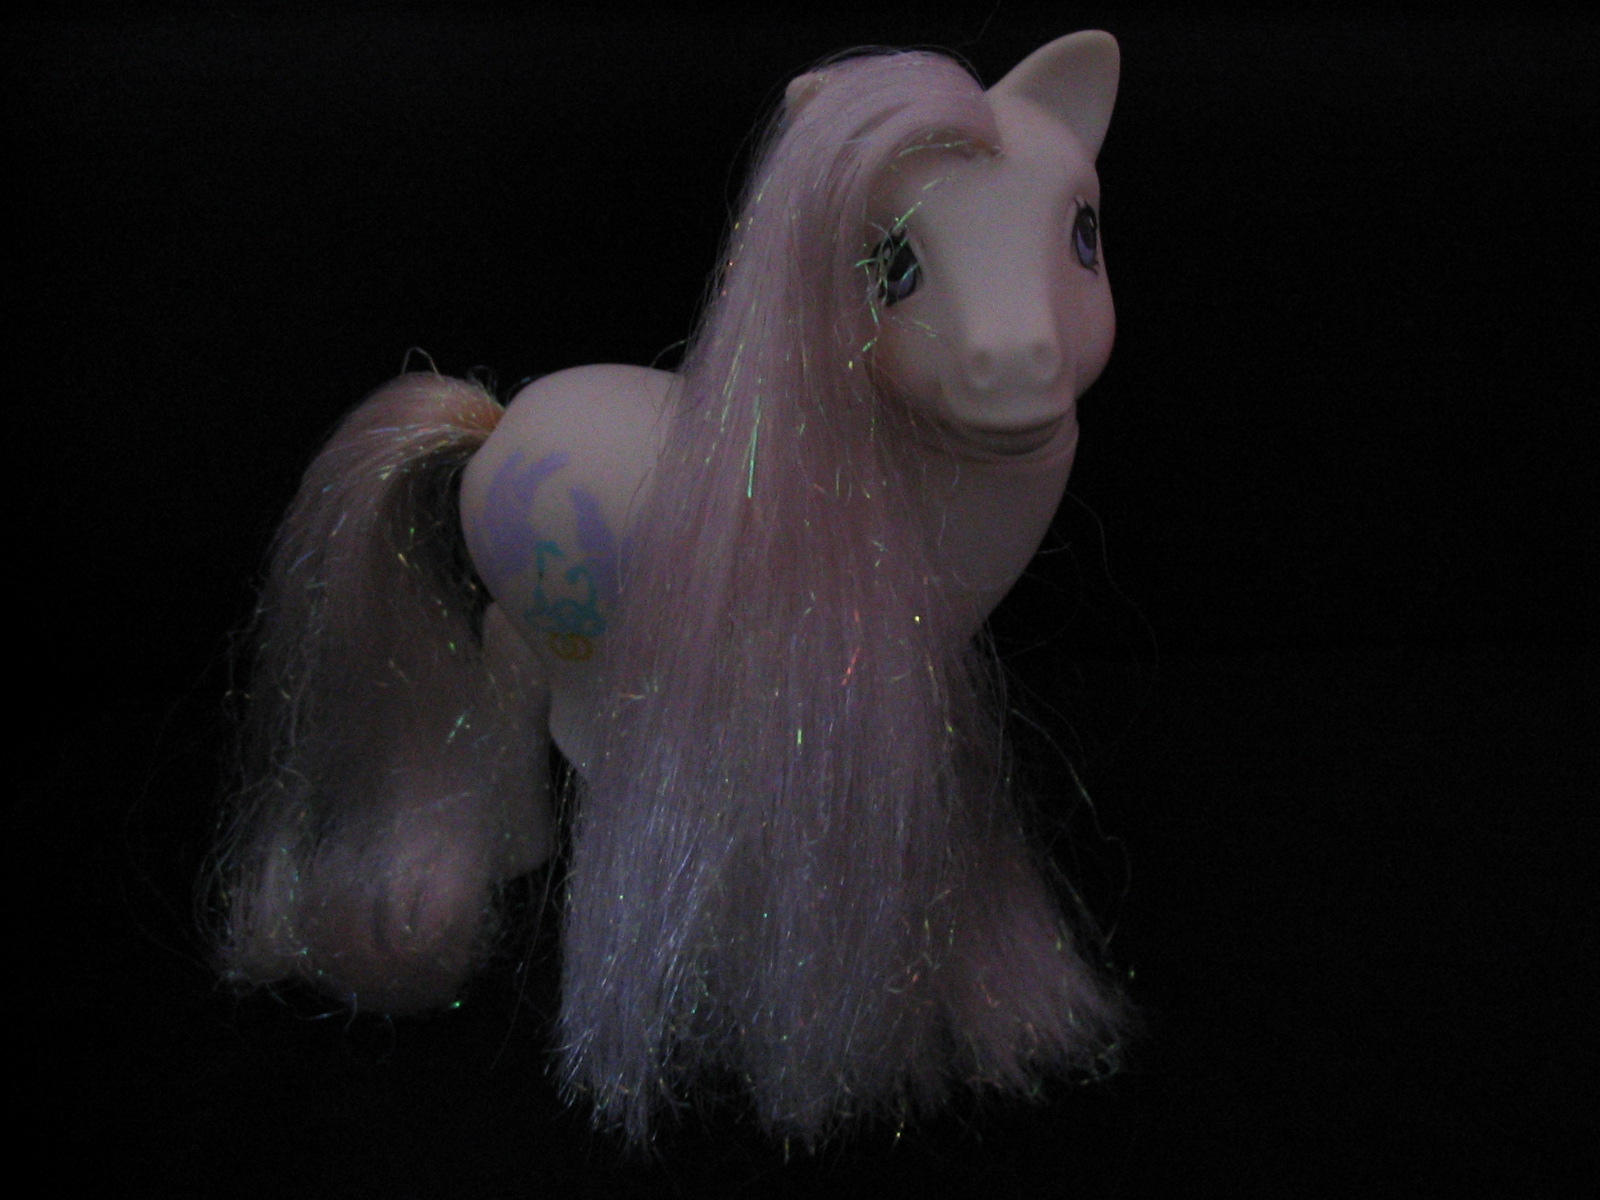 peony-stock: my little pony 3 by peony-stock